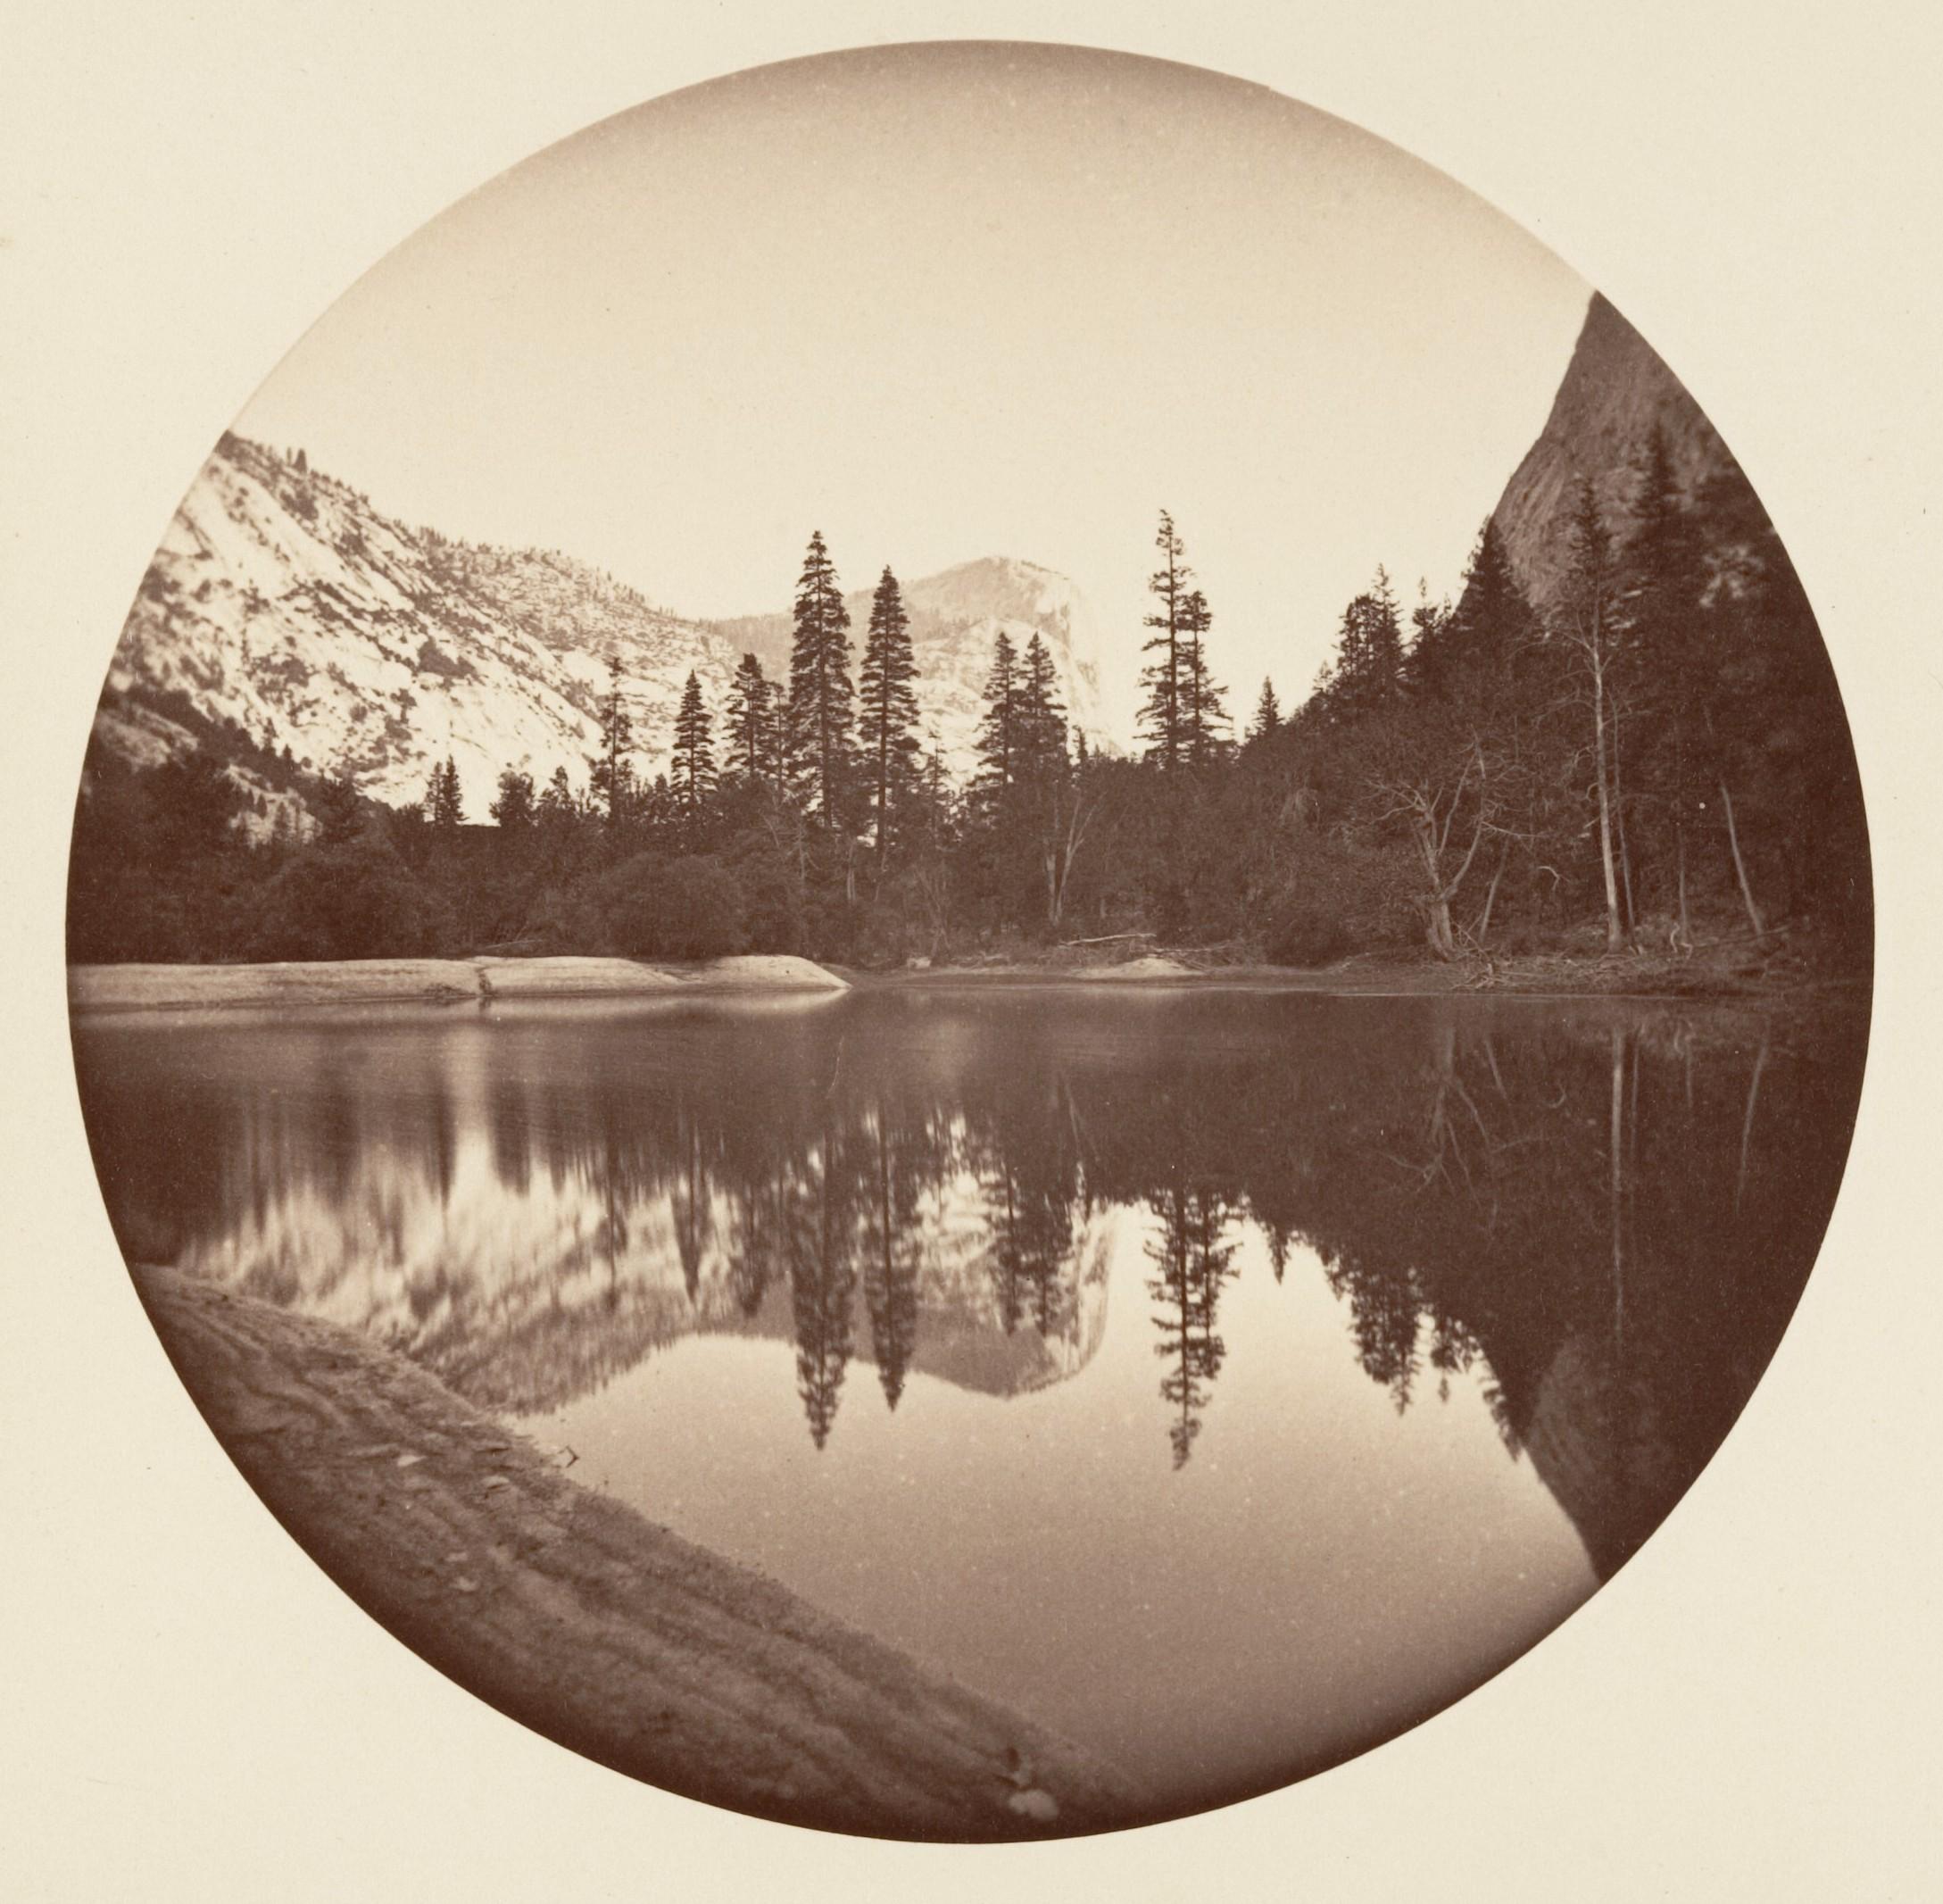 Fotó: Carleton Watkins: [Yosemite National Park, California], ca. 1878 © Carleton Watkins / The Metropolitan Museum of Art